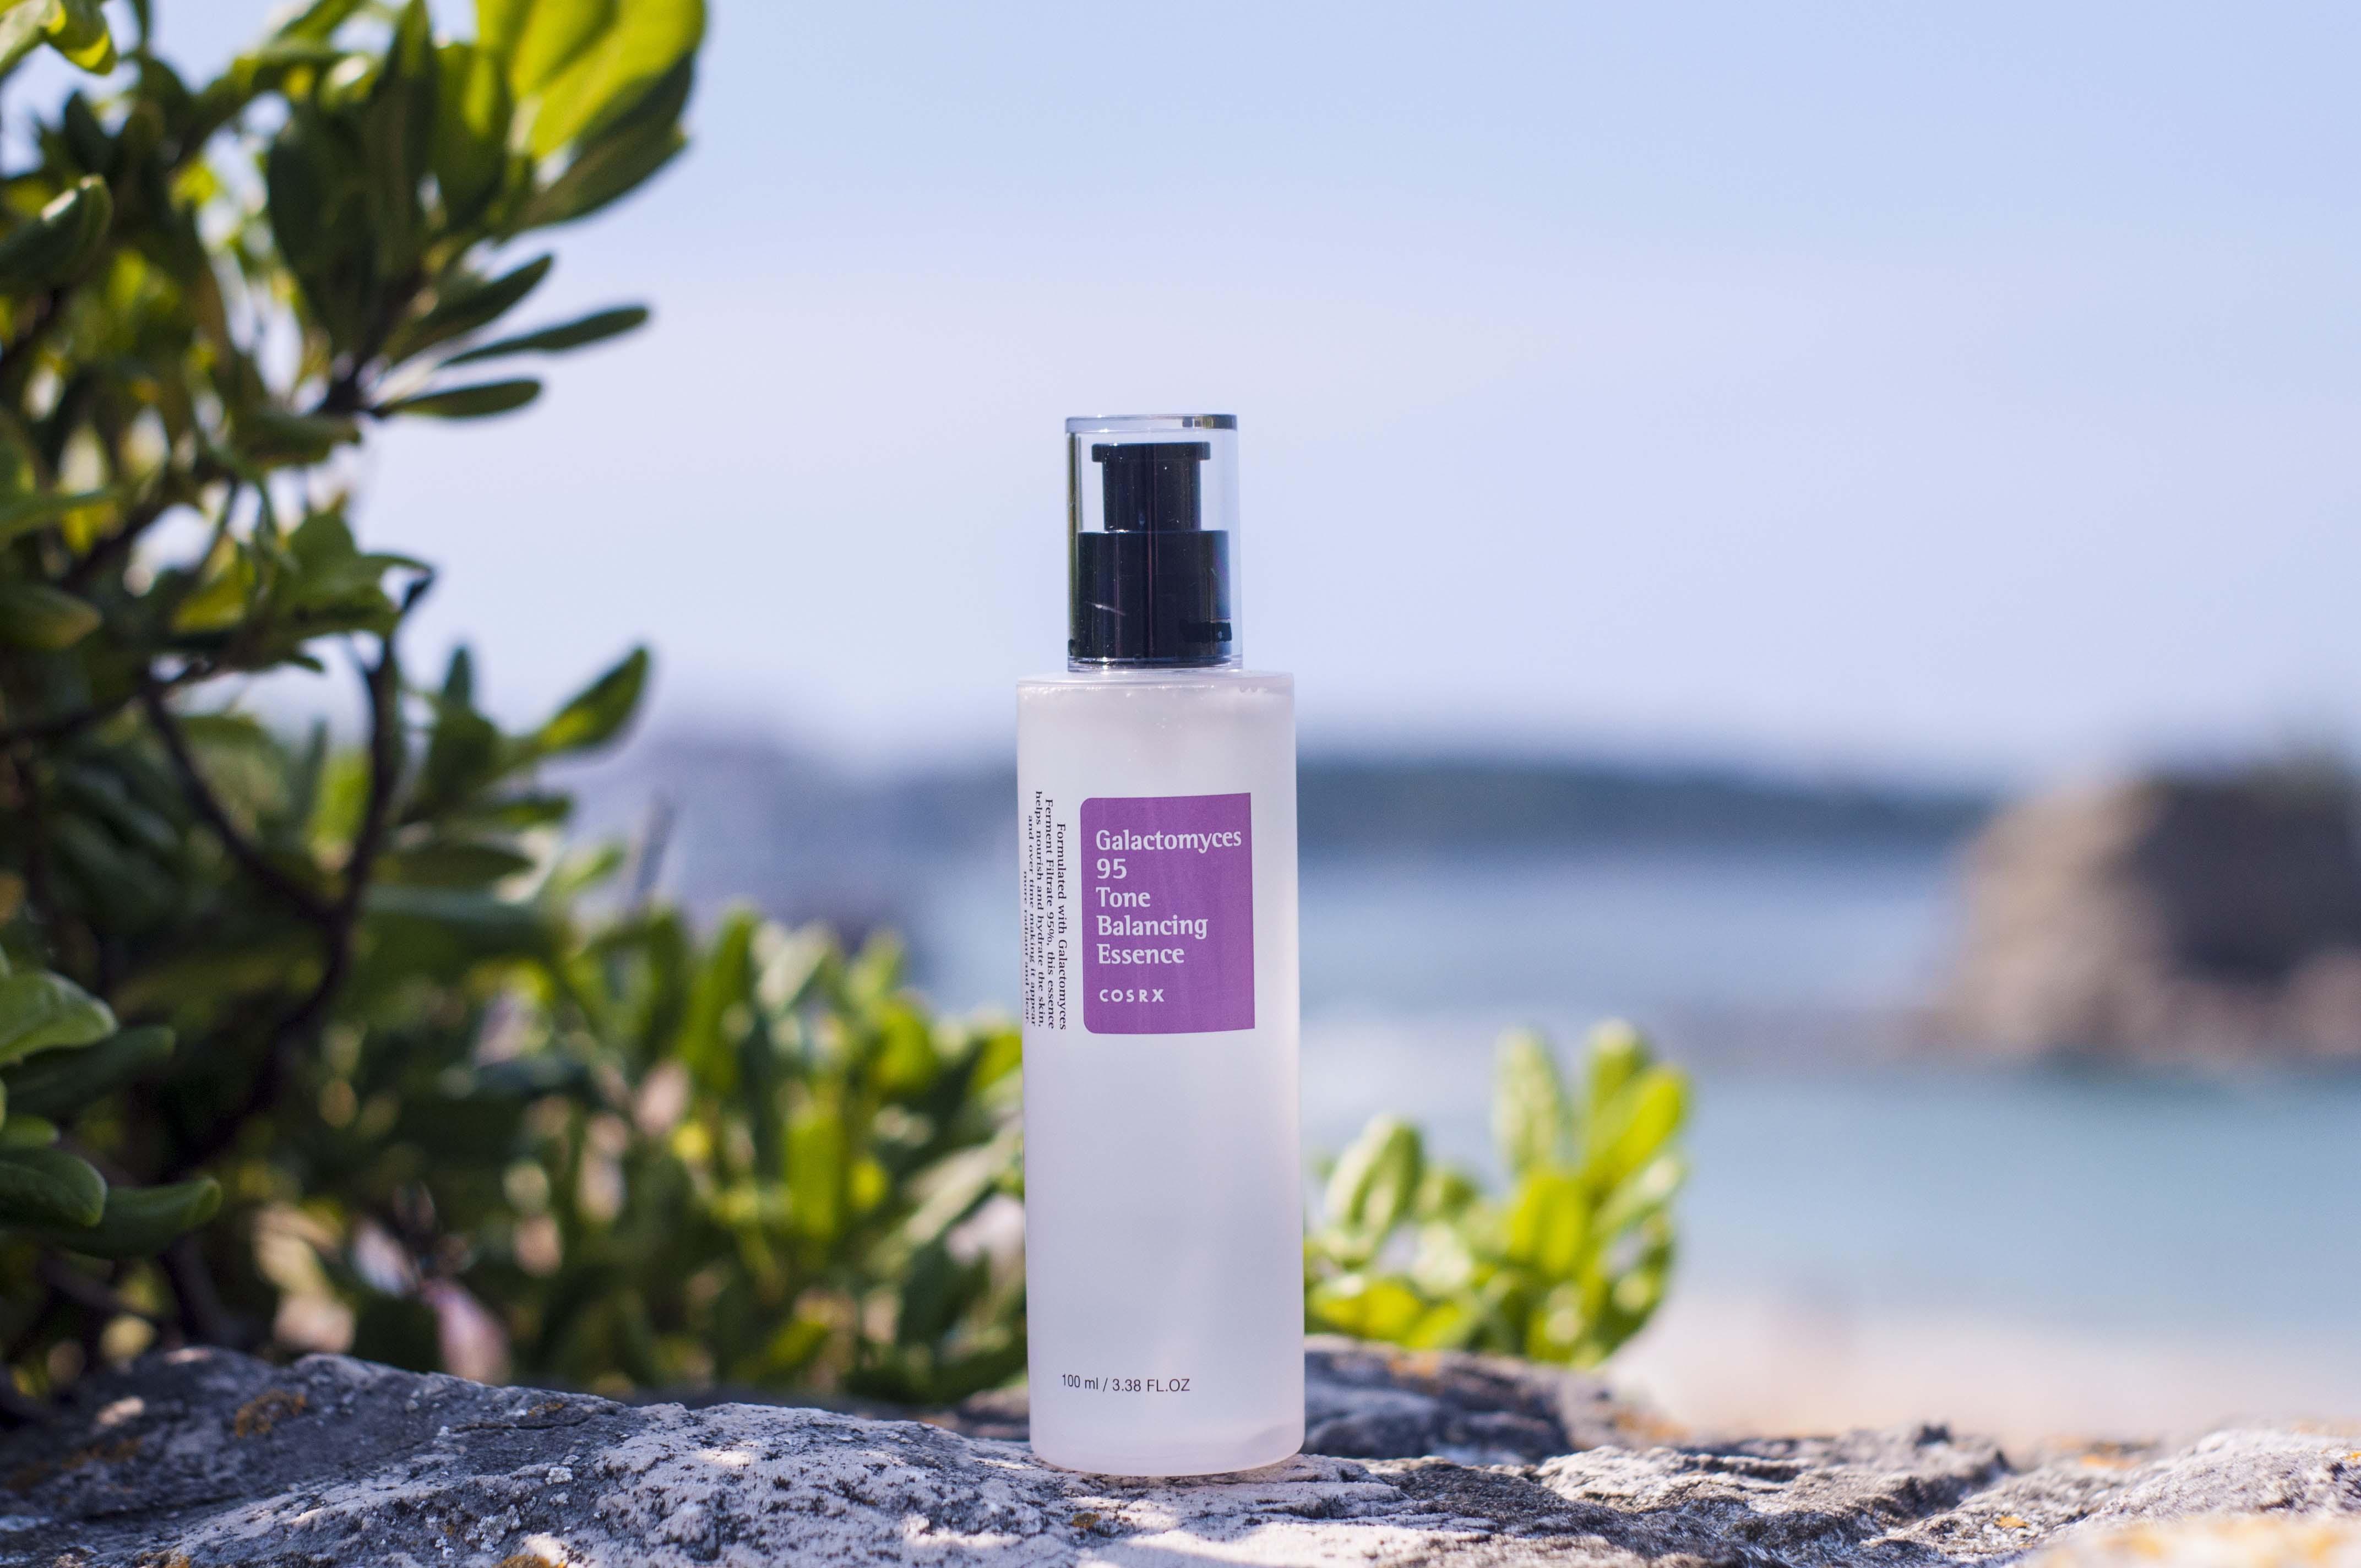 COSRX-Essence-Blueberry Cosmetics tratar las manchas